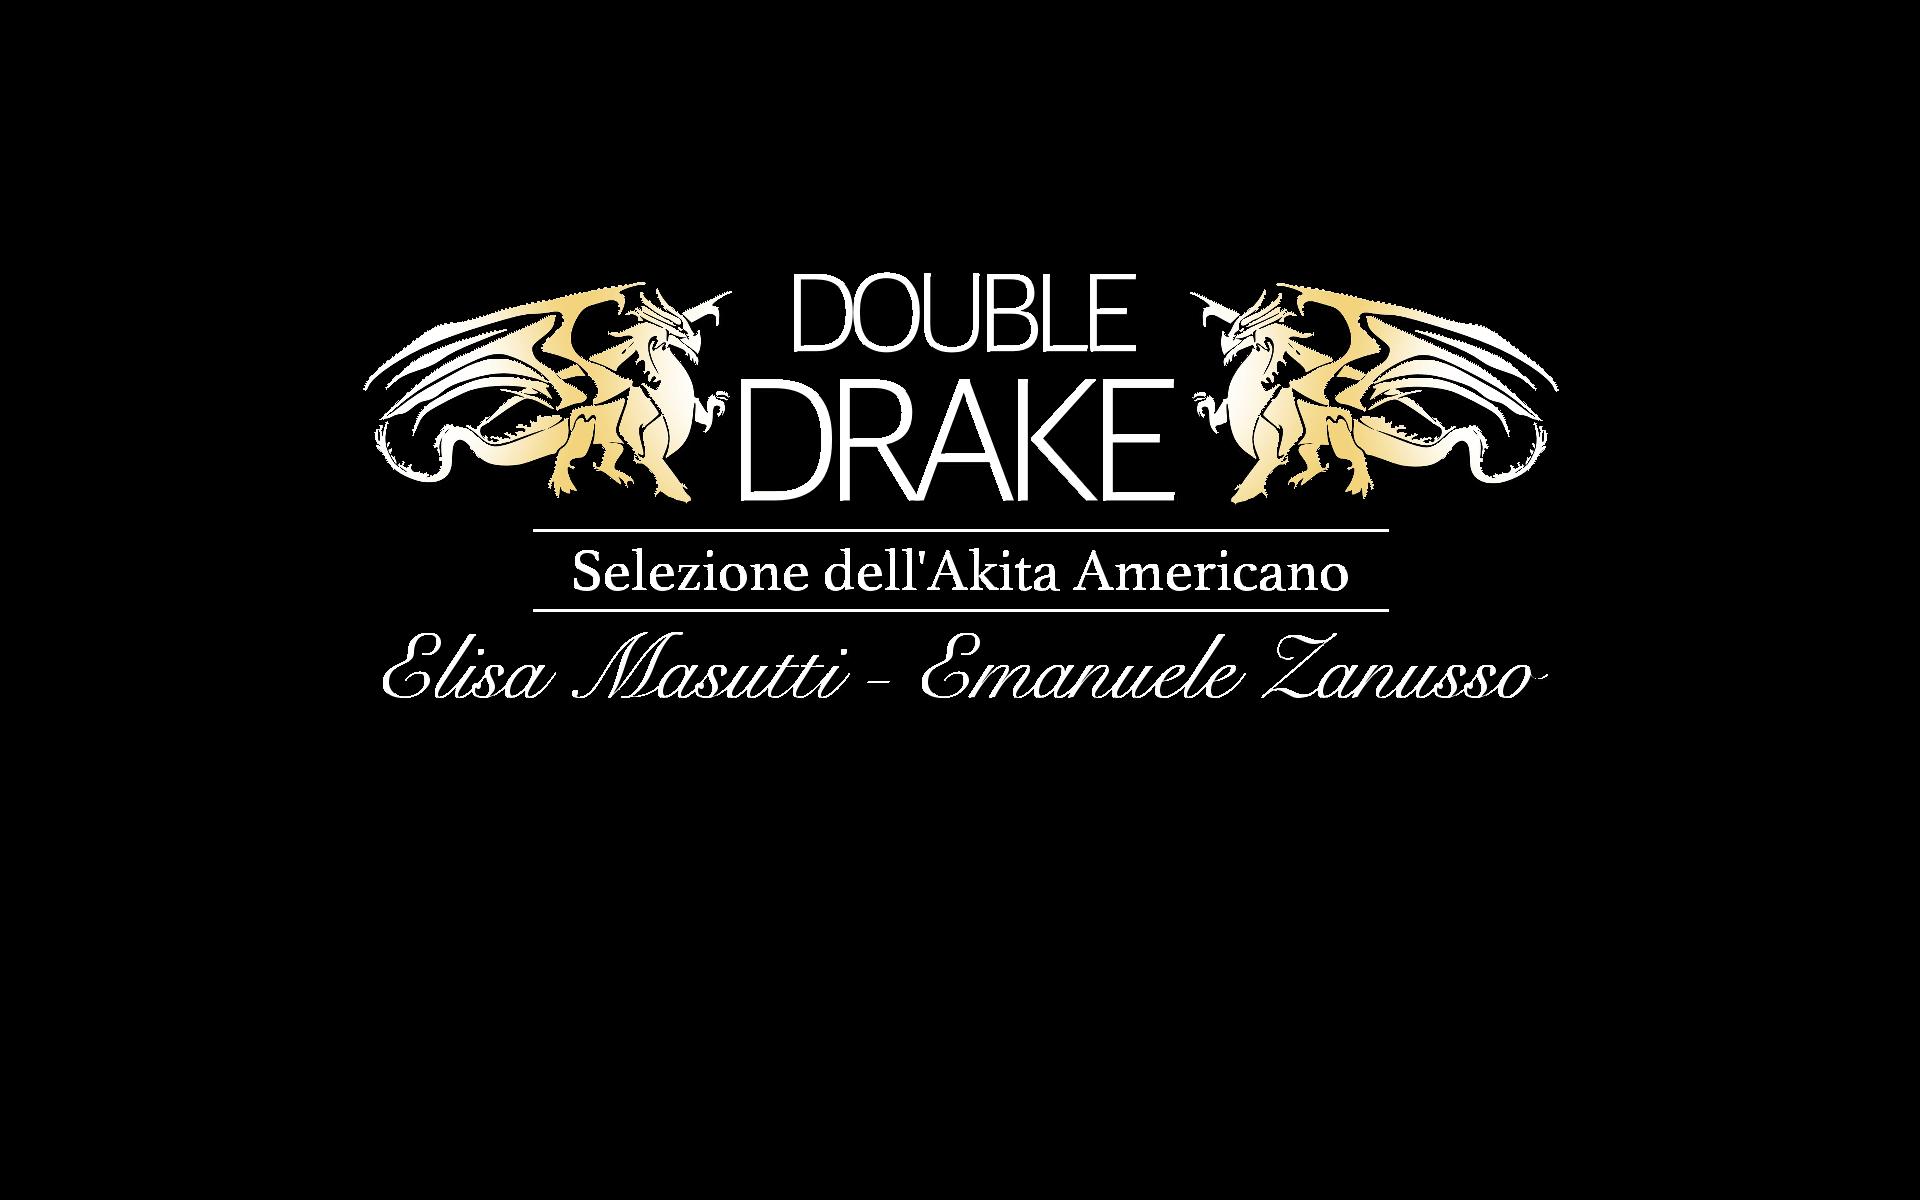 Double Drake